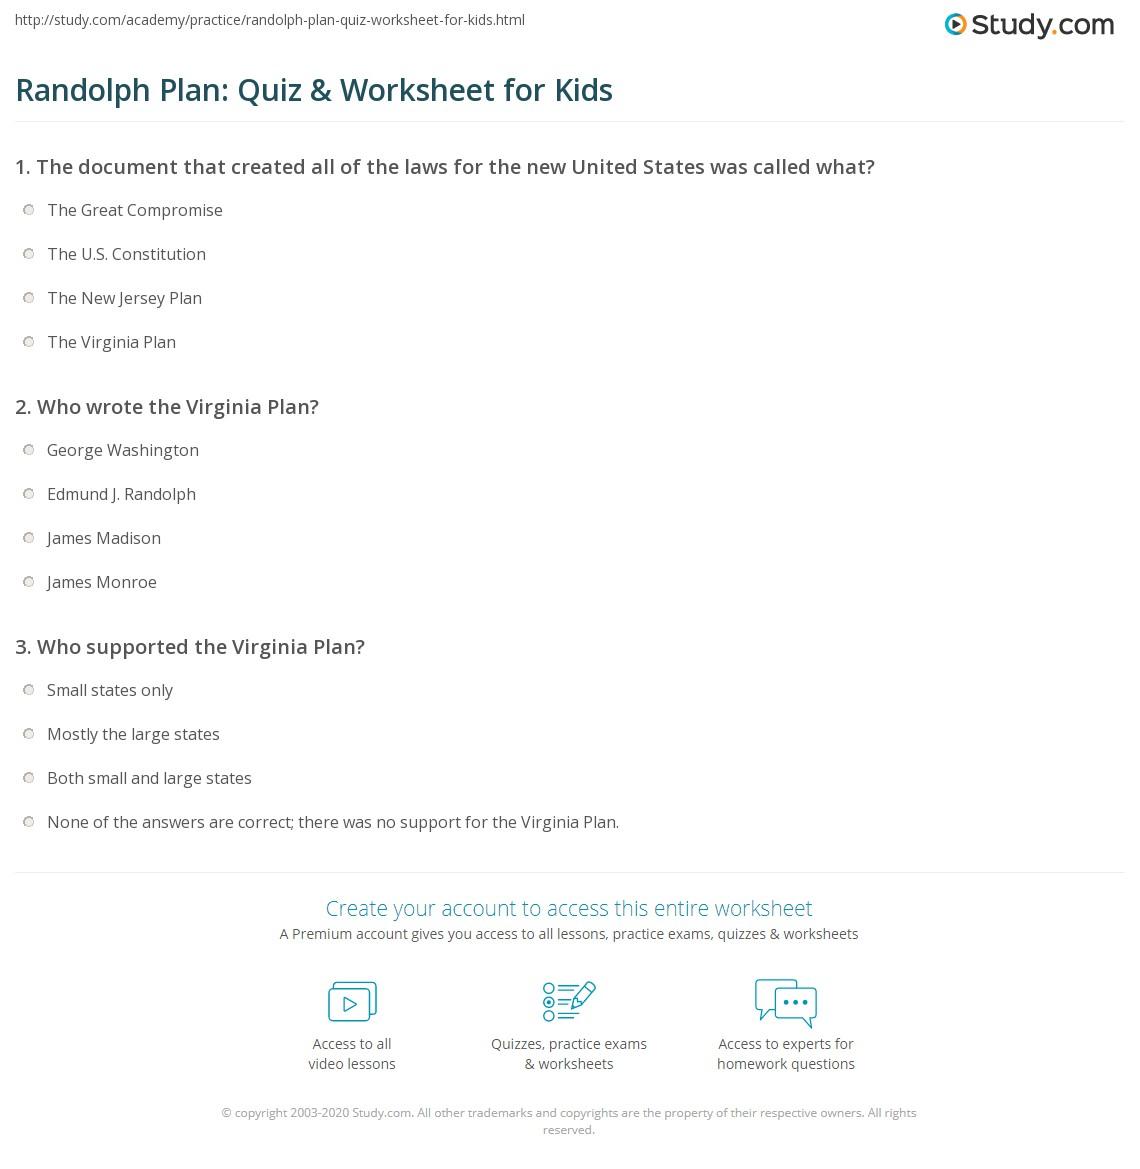 randolph plan: quiz & worksheet for kids | study